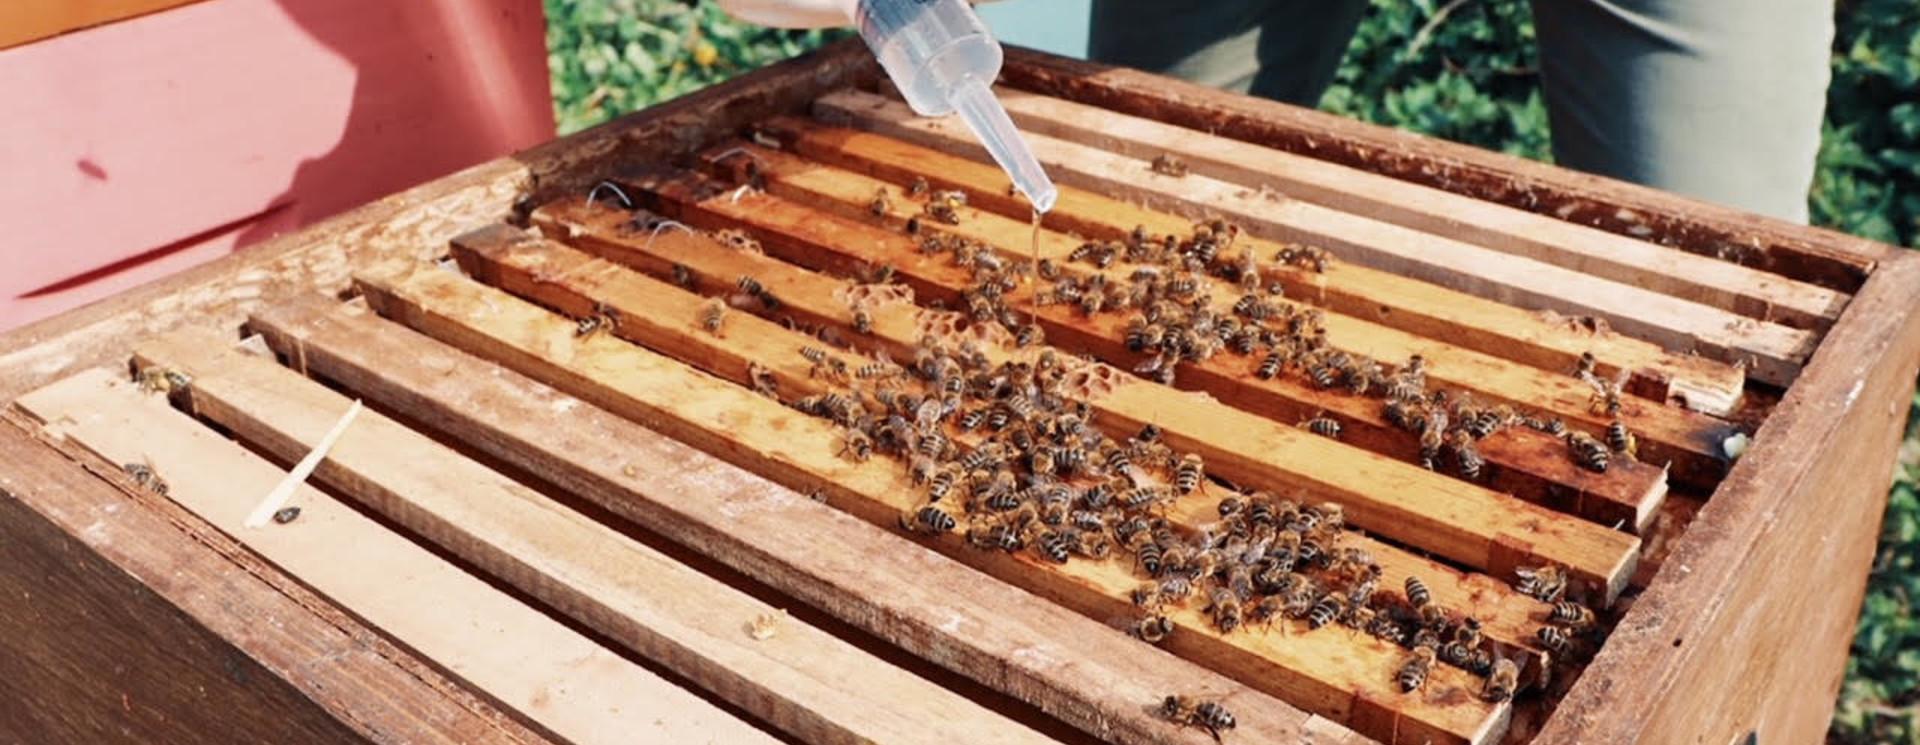 Hive hygiene